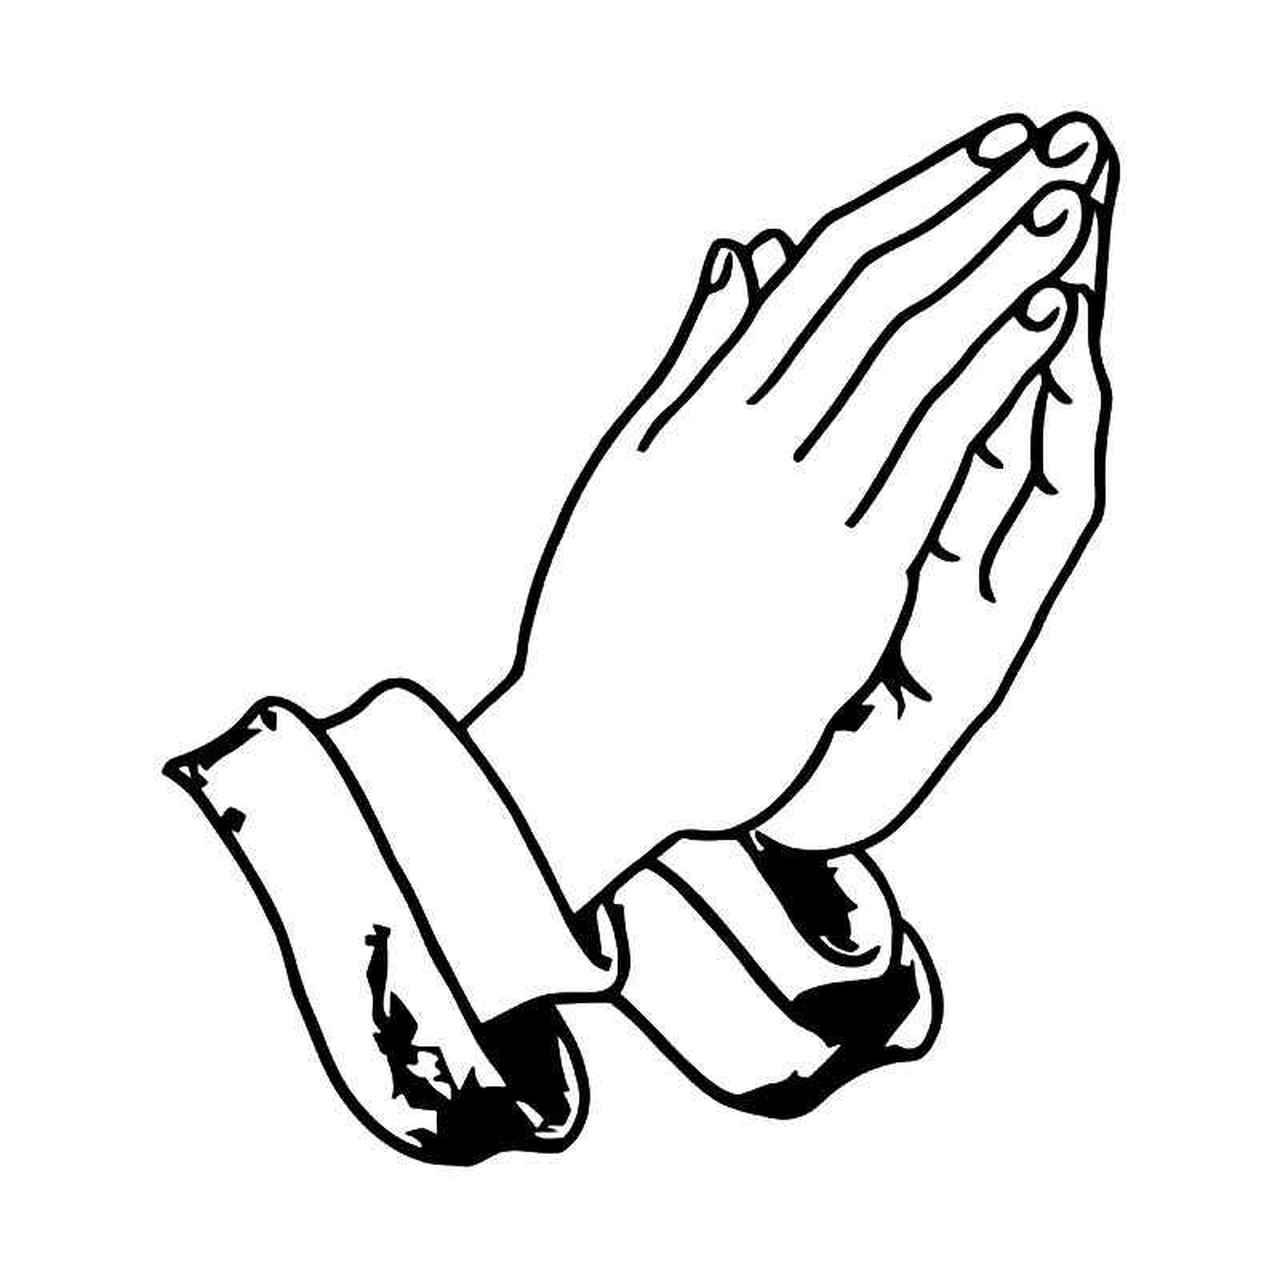 Prayer Request / Testimony